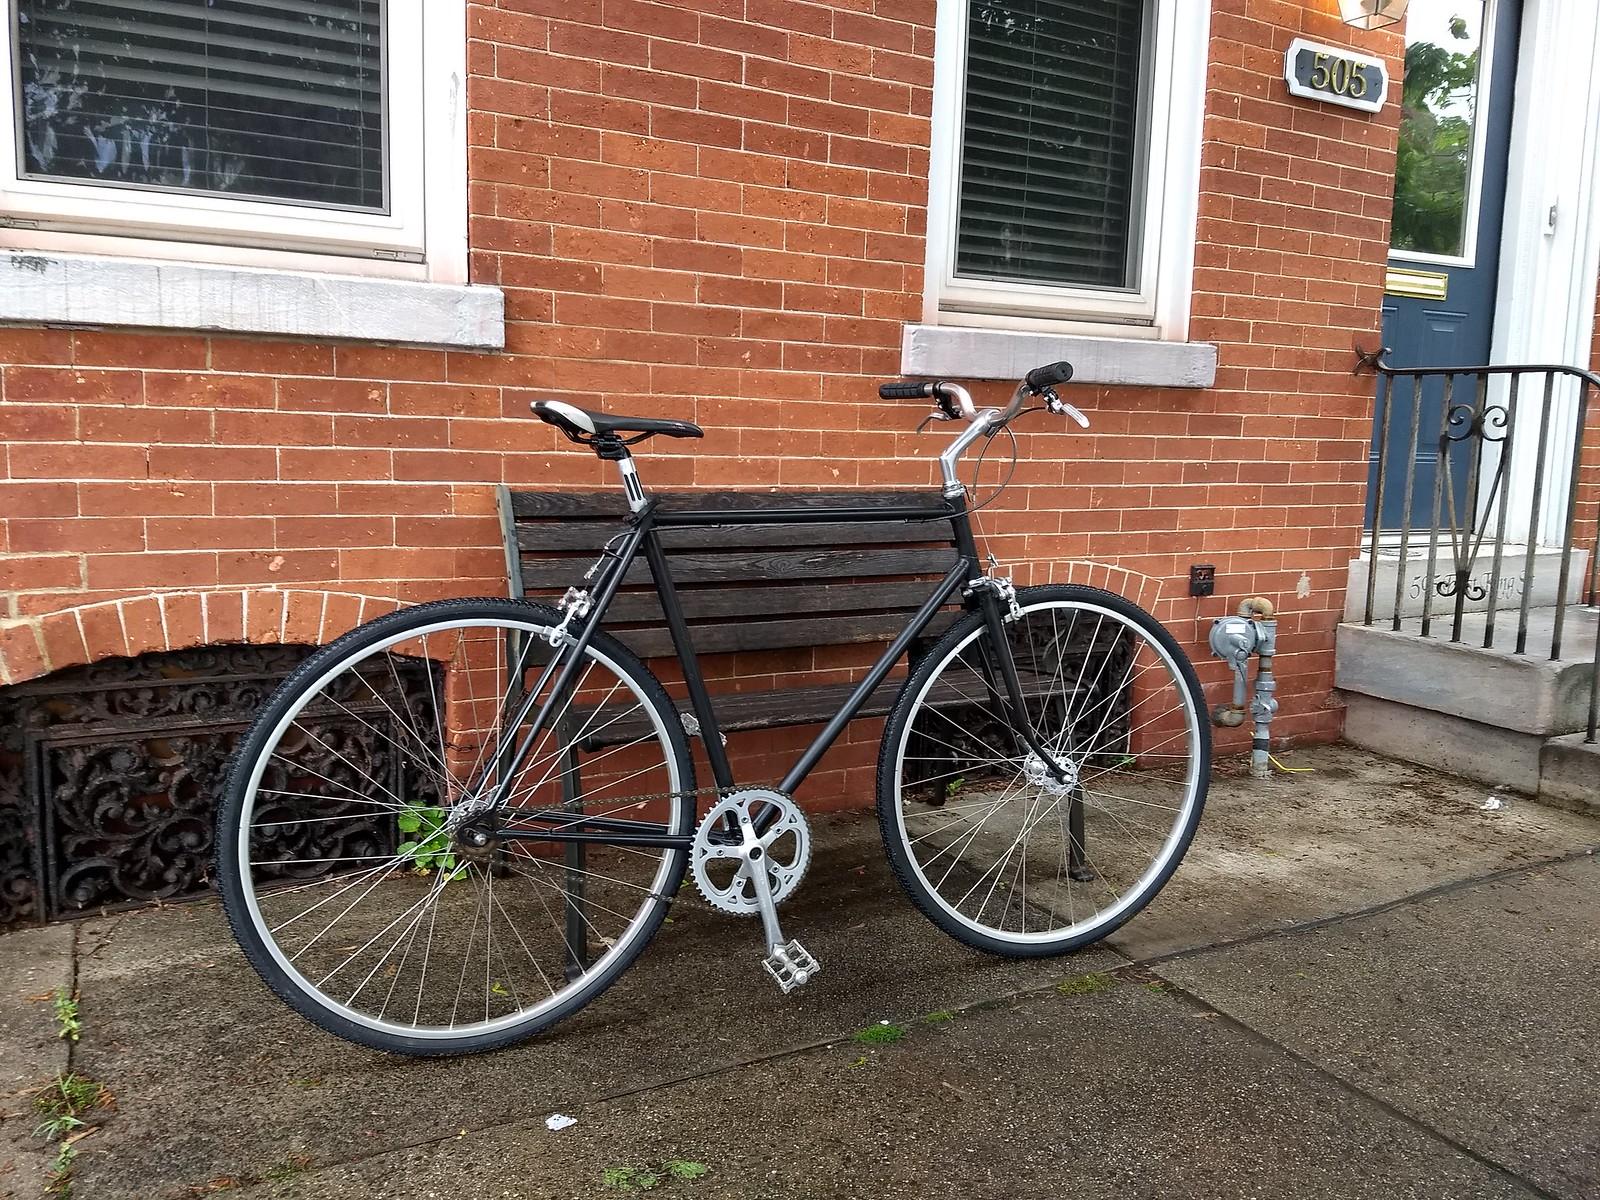 Reversed Chop & Flop Handlebar - Page 8 - Bike Forums